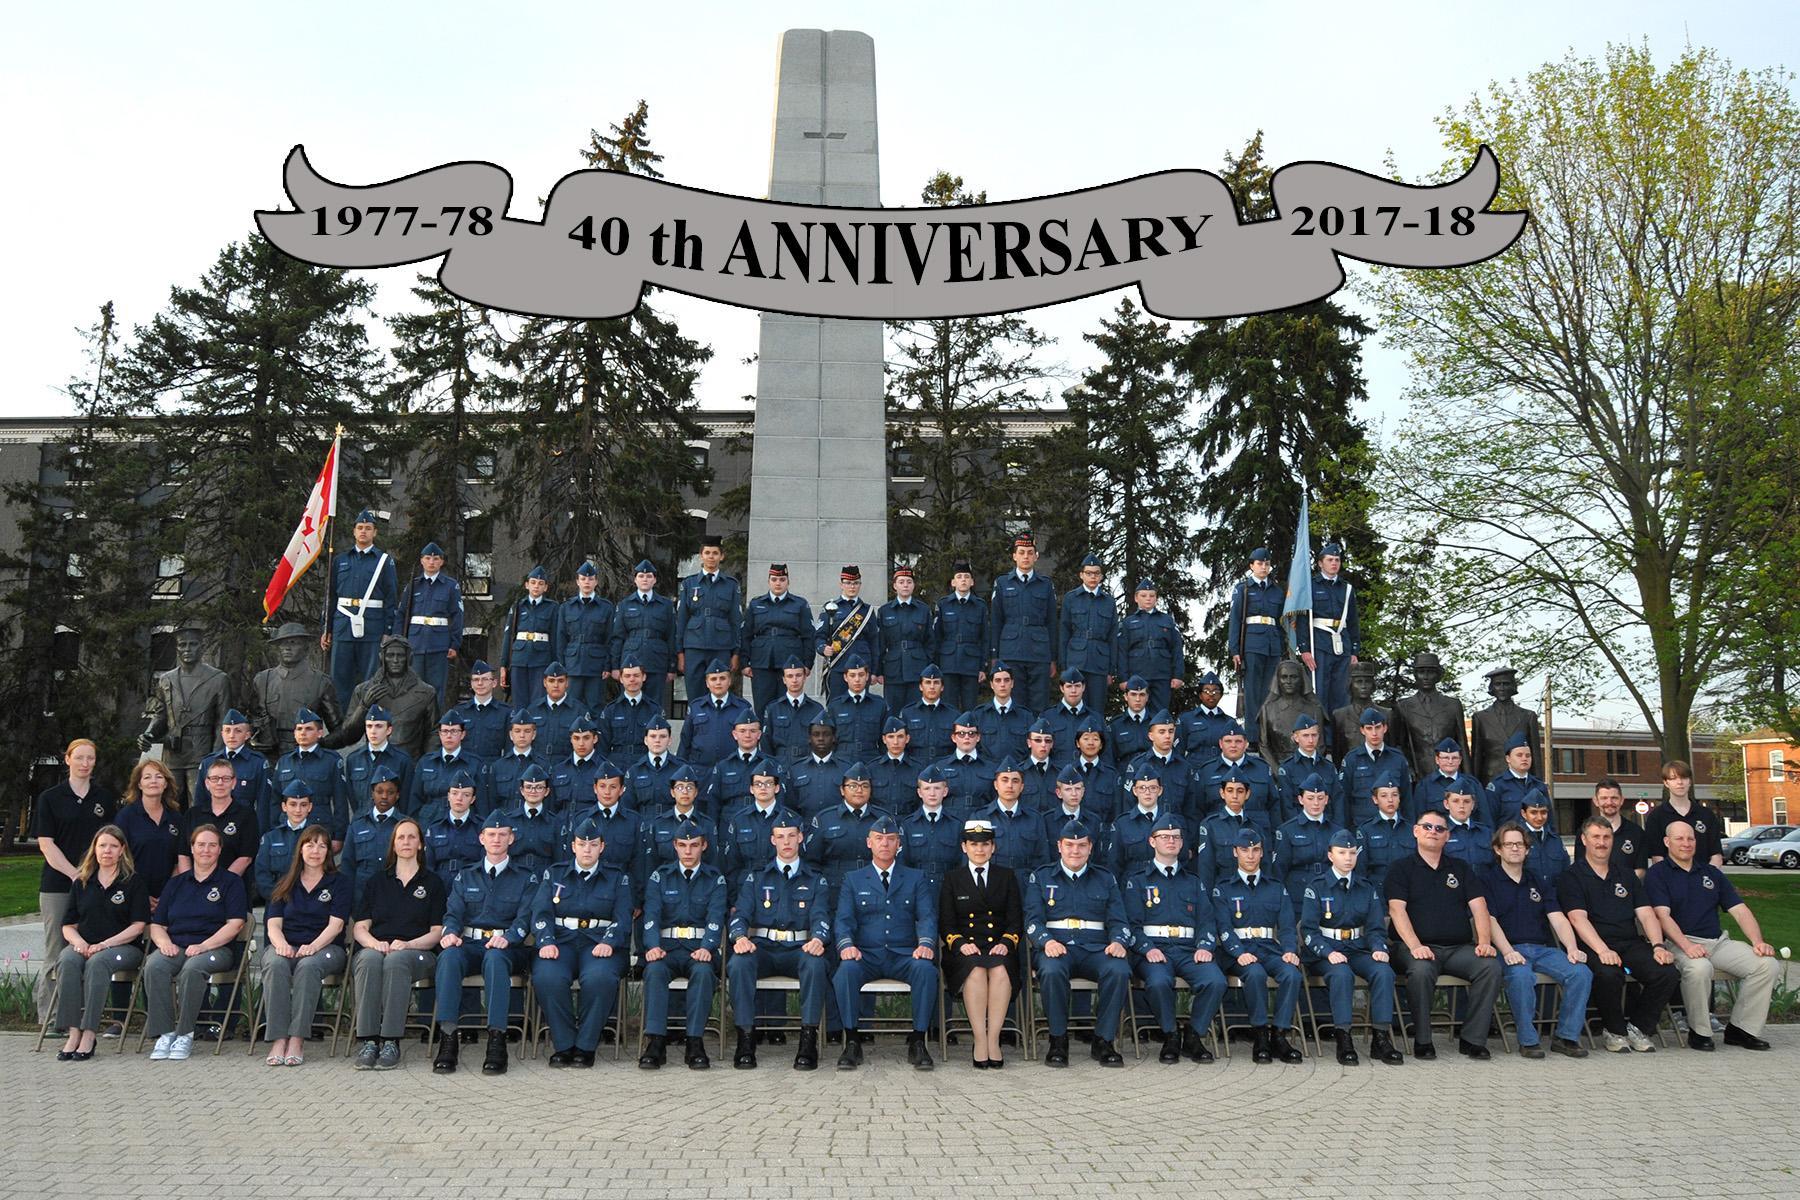 2017-18 Sqn photo